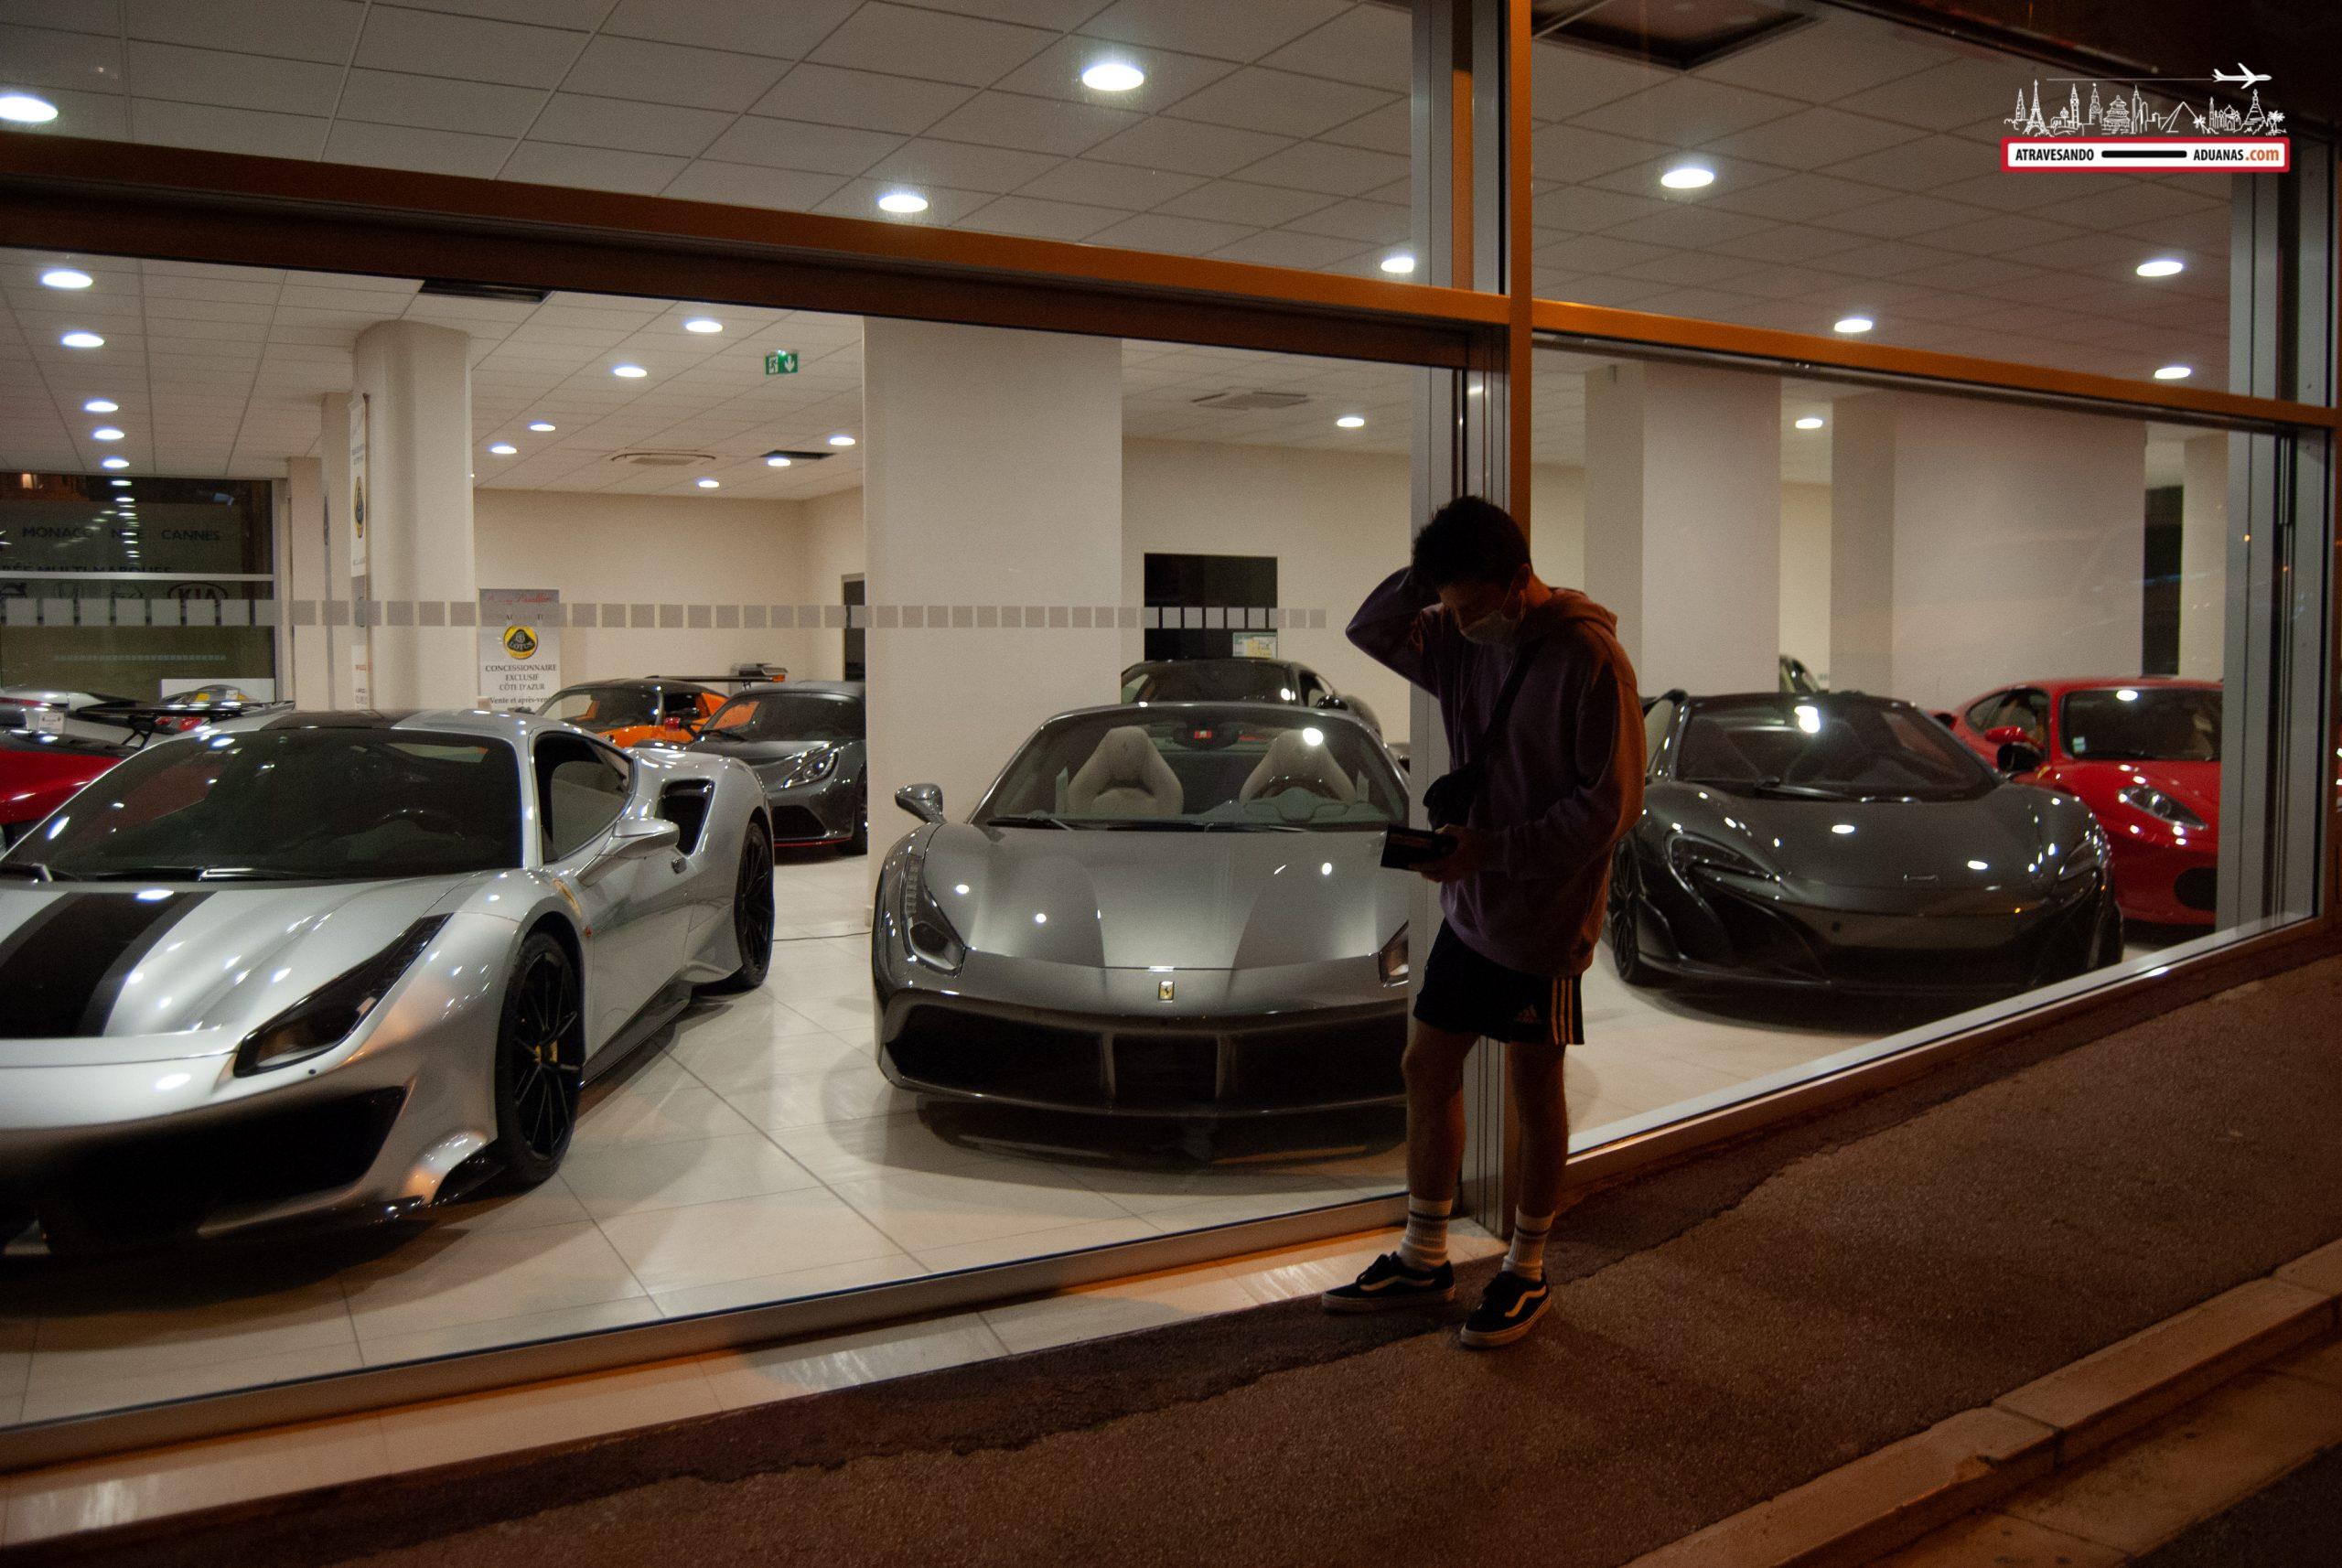 Escaparate con coches de lujo en Mónaco